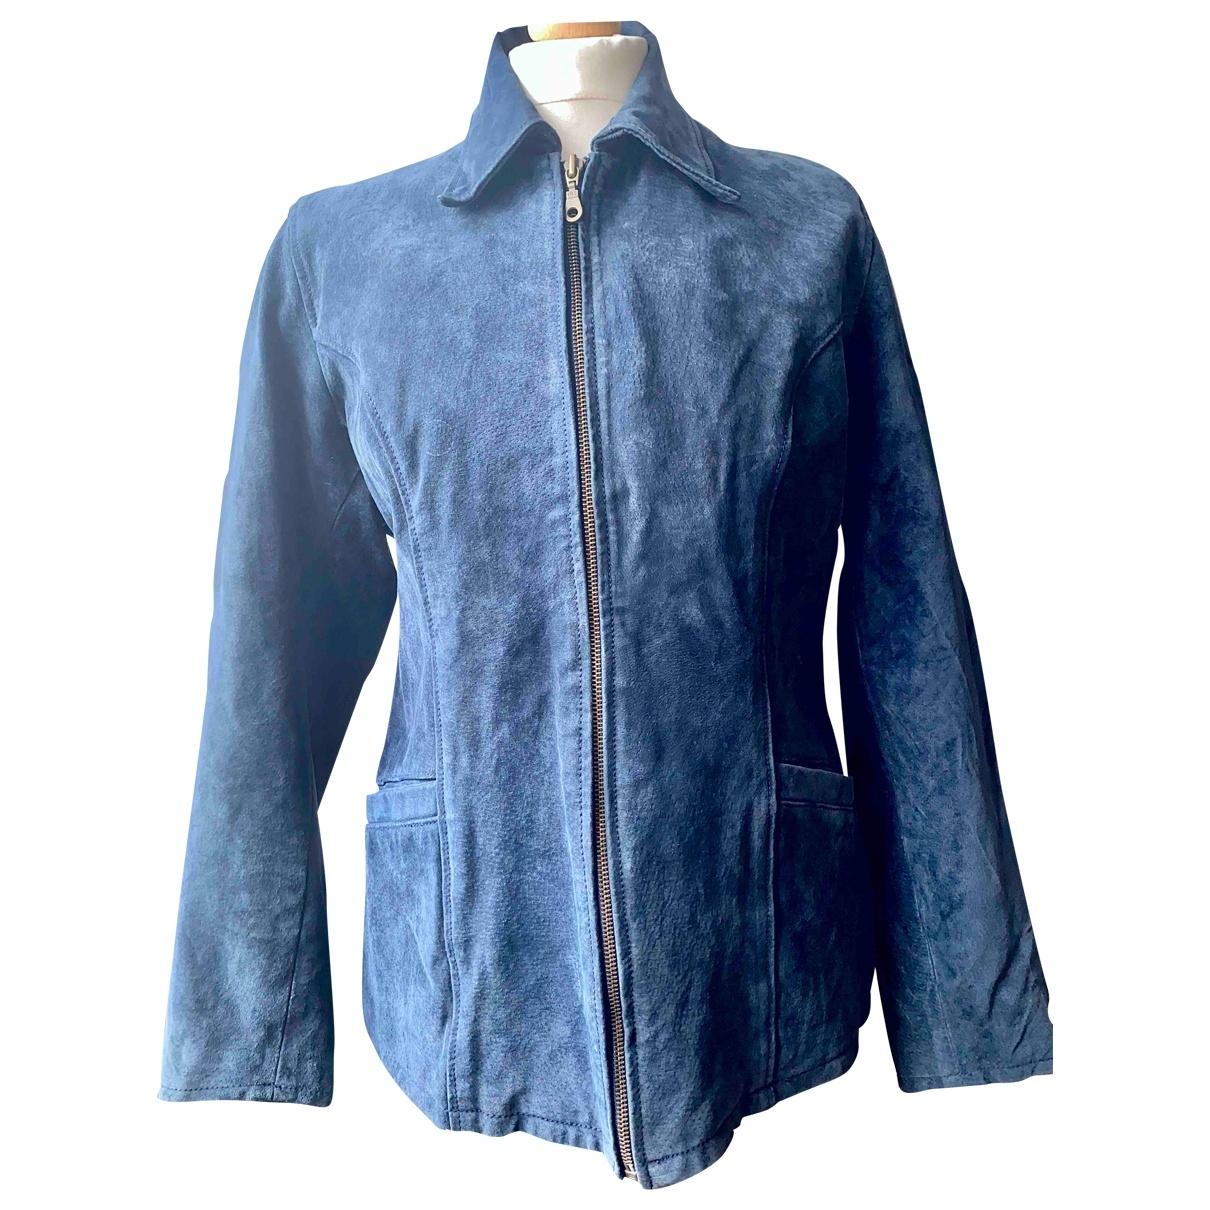 Adored Vintage \N Navy Suede jacket for Women 40 FR